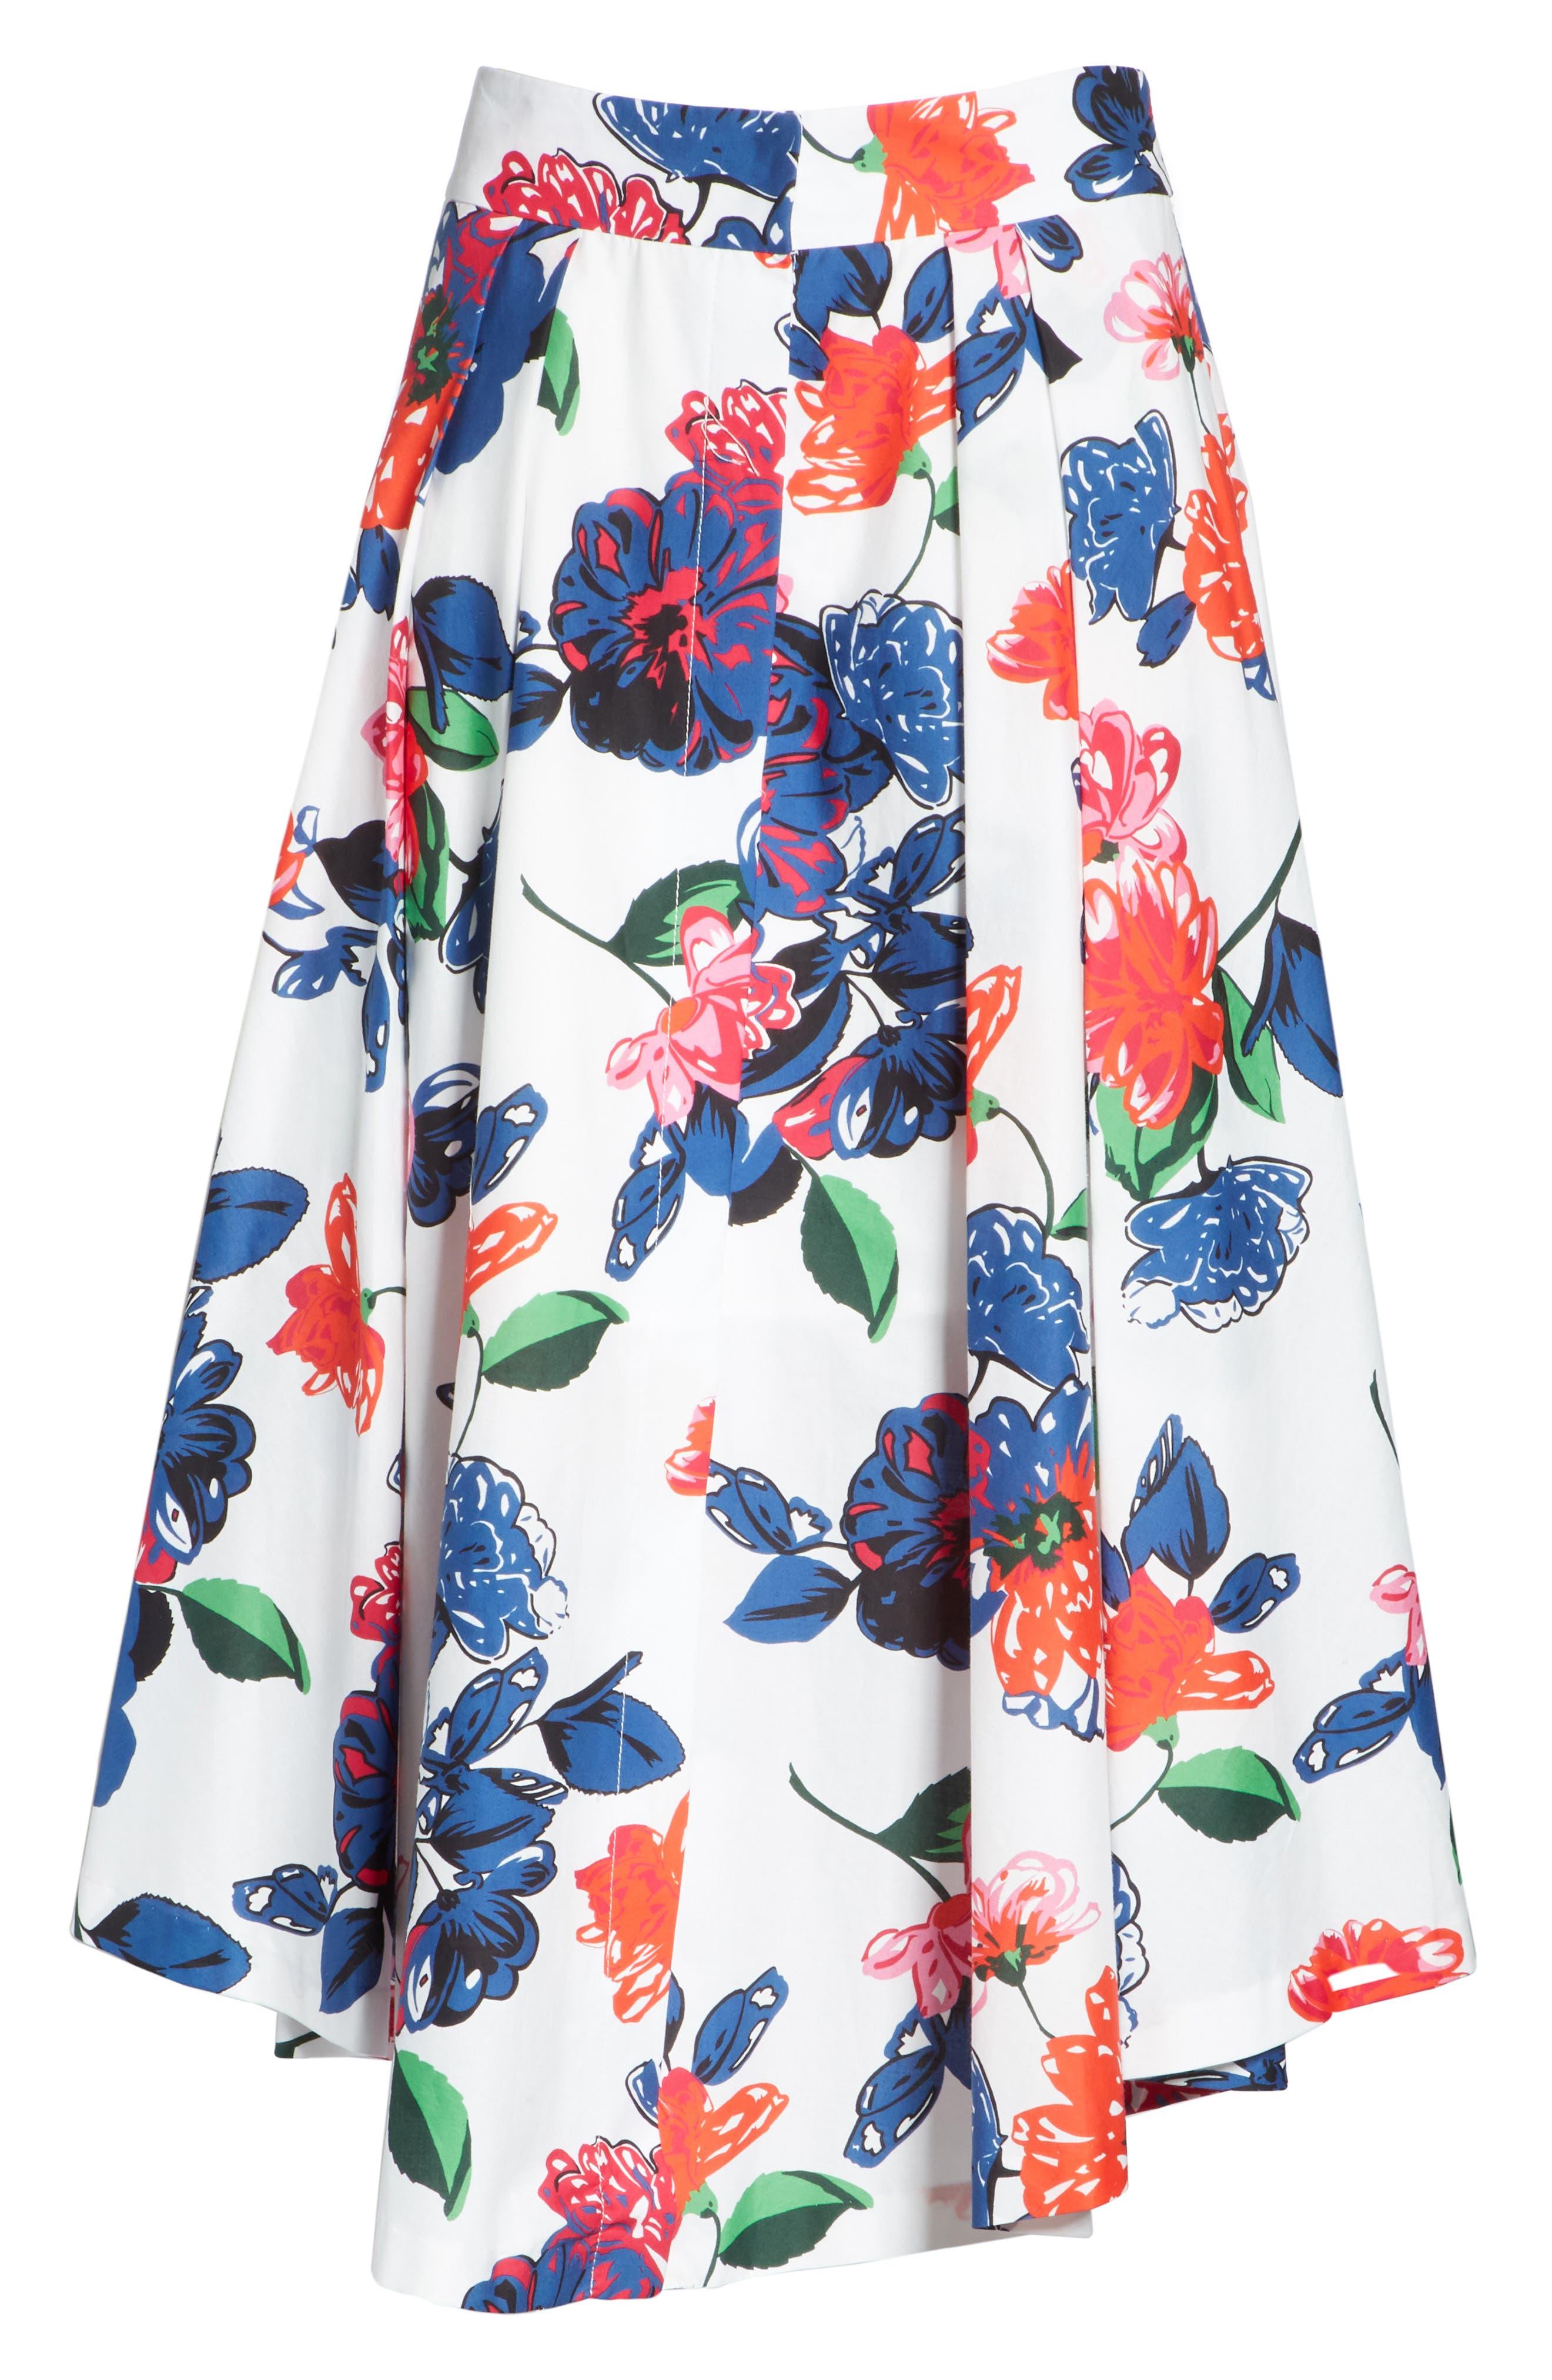 Floral Print Stretch Cotton Skirt,                             Alternate thumbnail 6, color,                             164